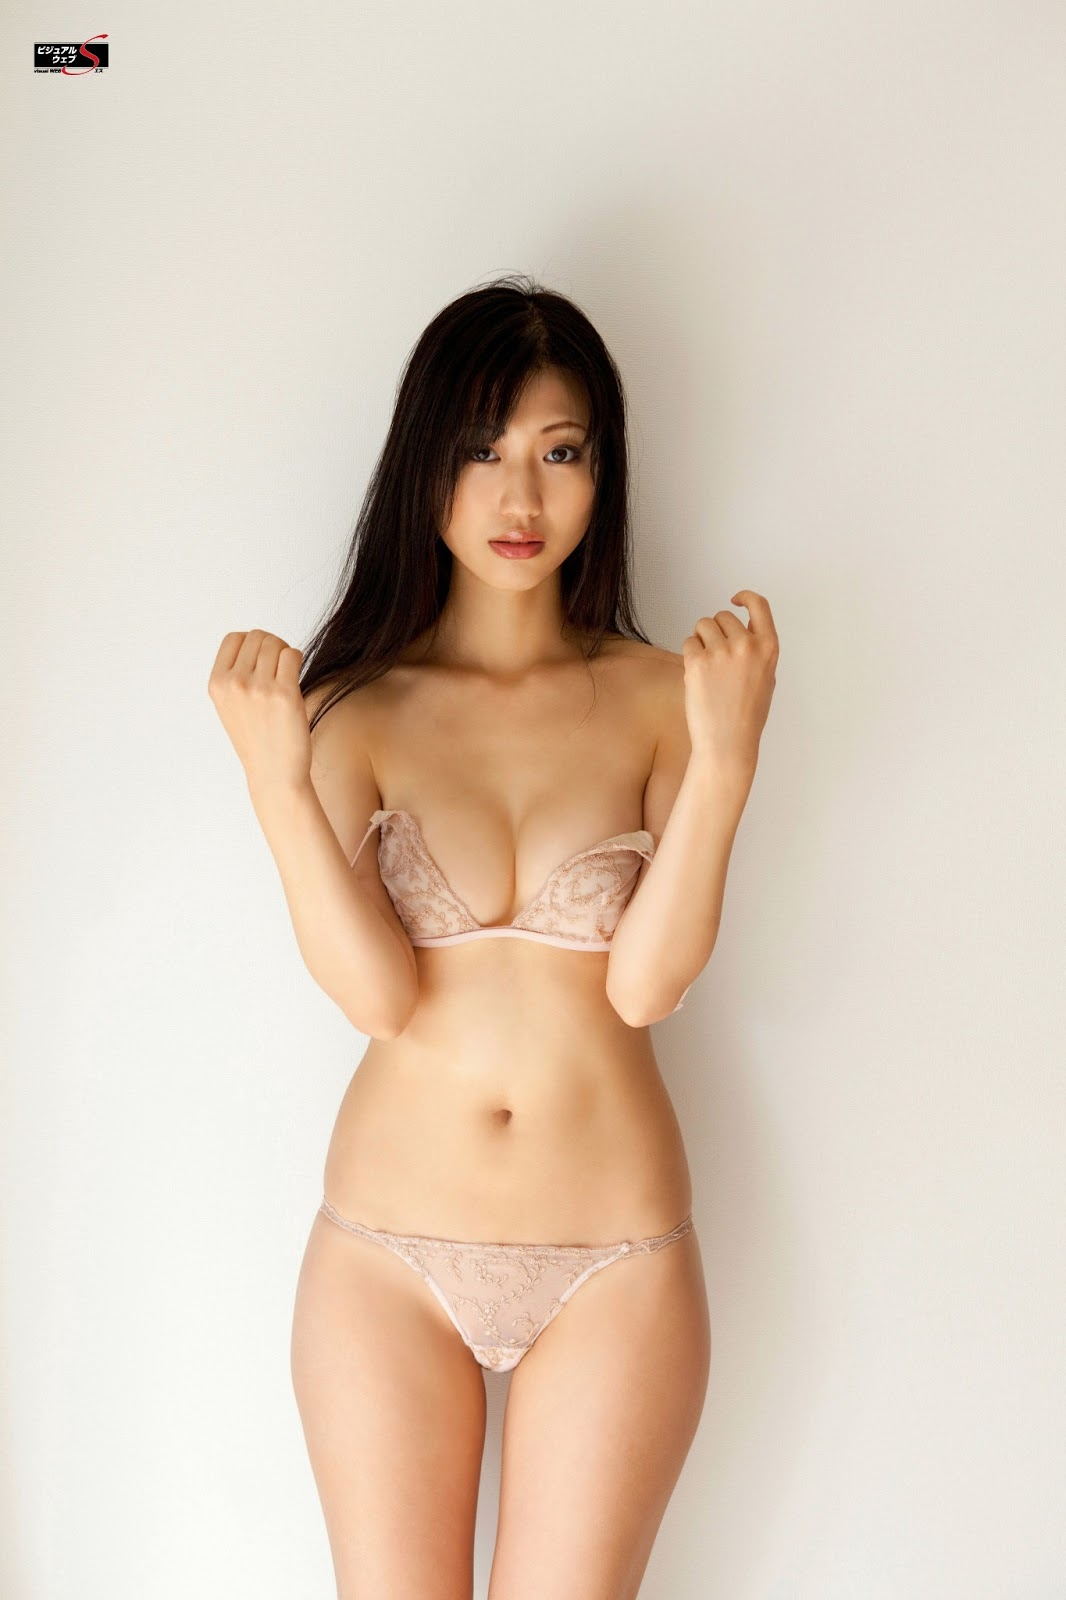 Knows Www japan sexyphotu gallare something